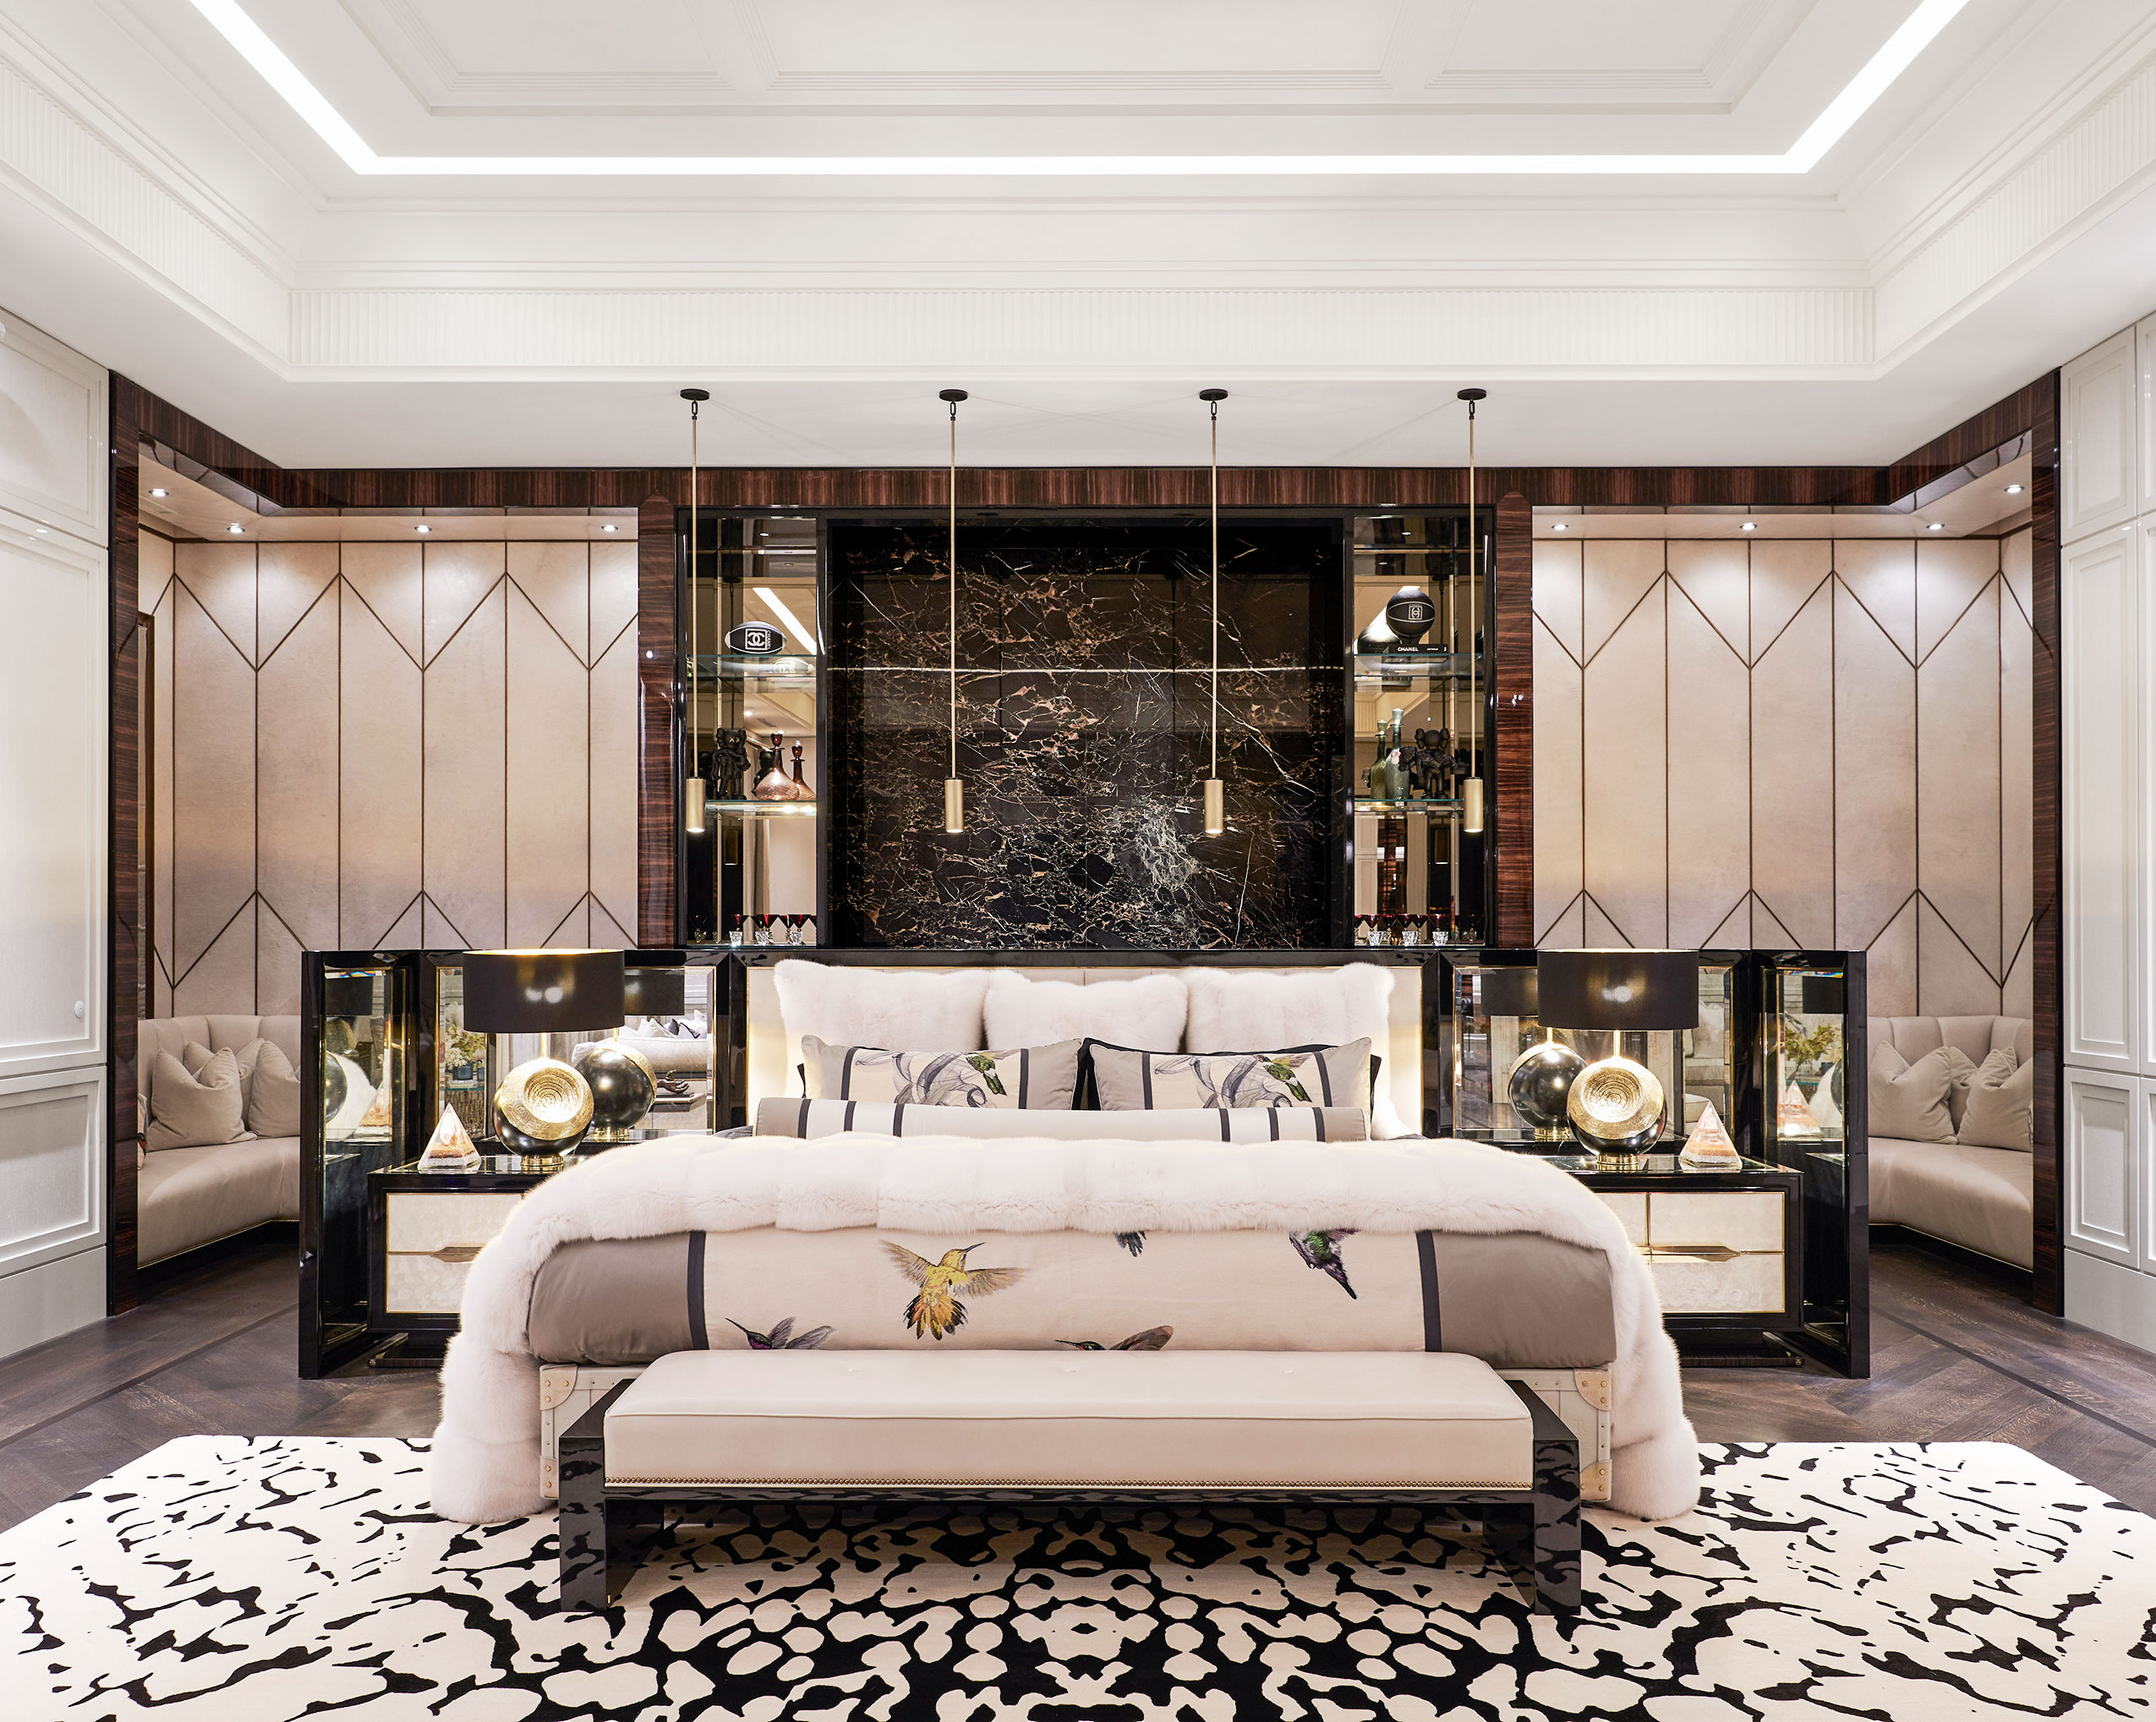 Drake opens doors to his extravagant Toronto mansion - CNN Style